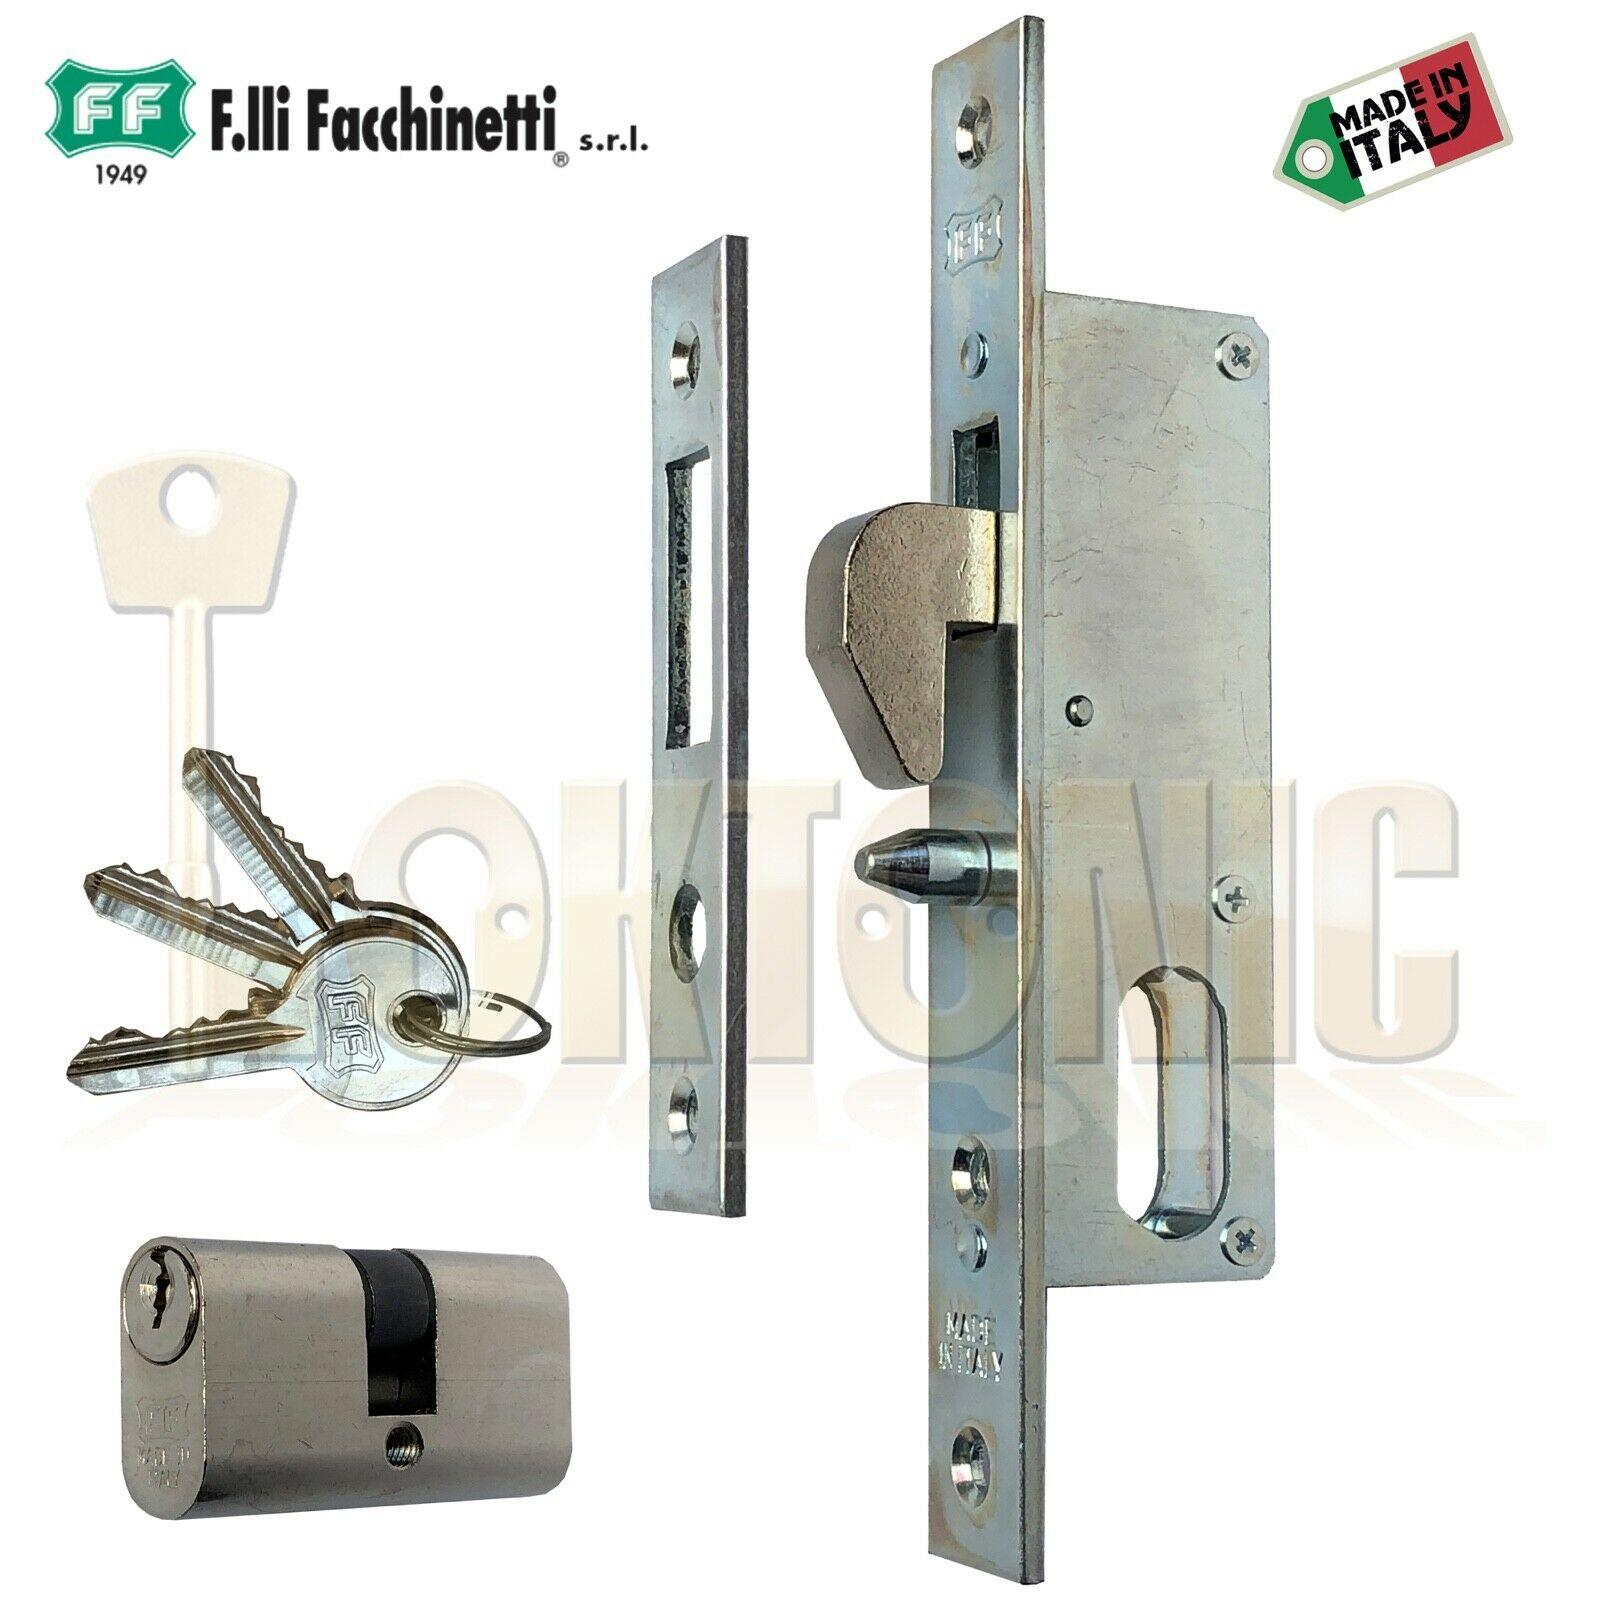 Facchinetti Narrow Stile Small Oval Cylinder Hook bolt Sliding Door Lock